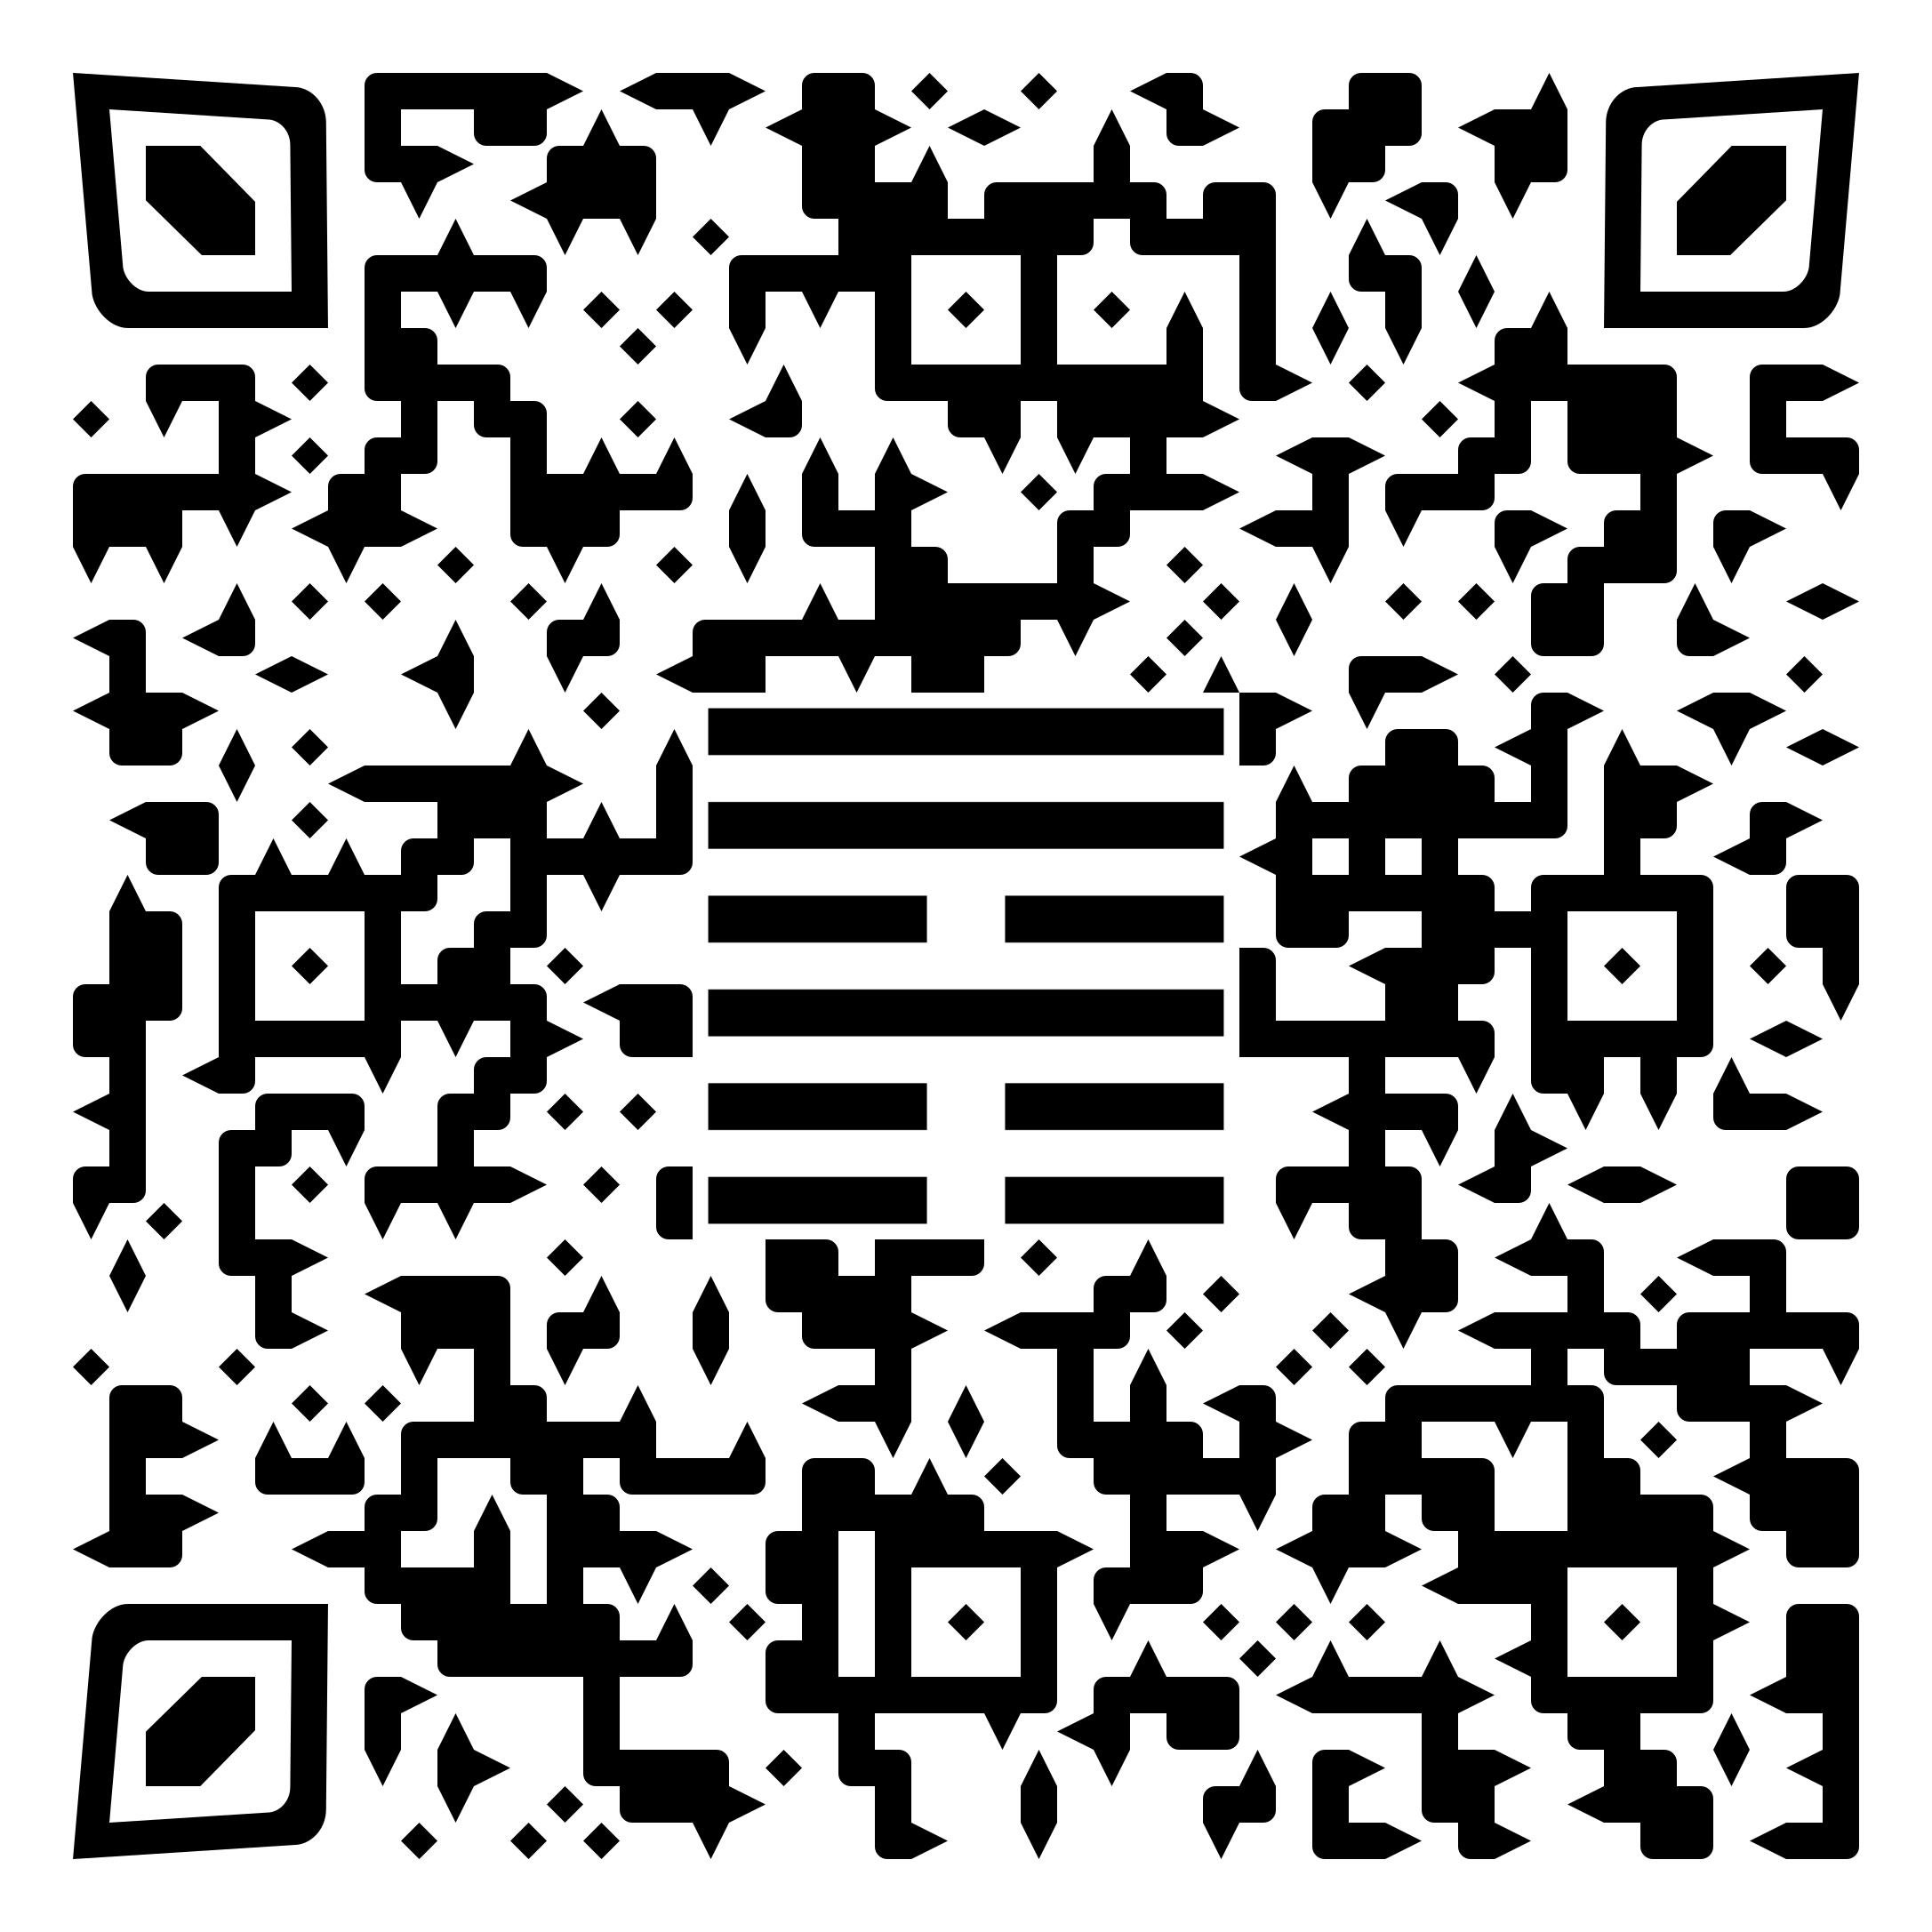 qr-code-52.png